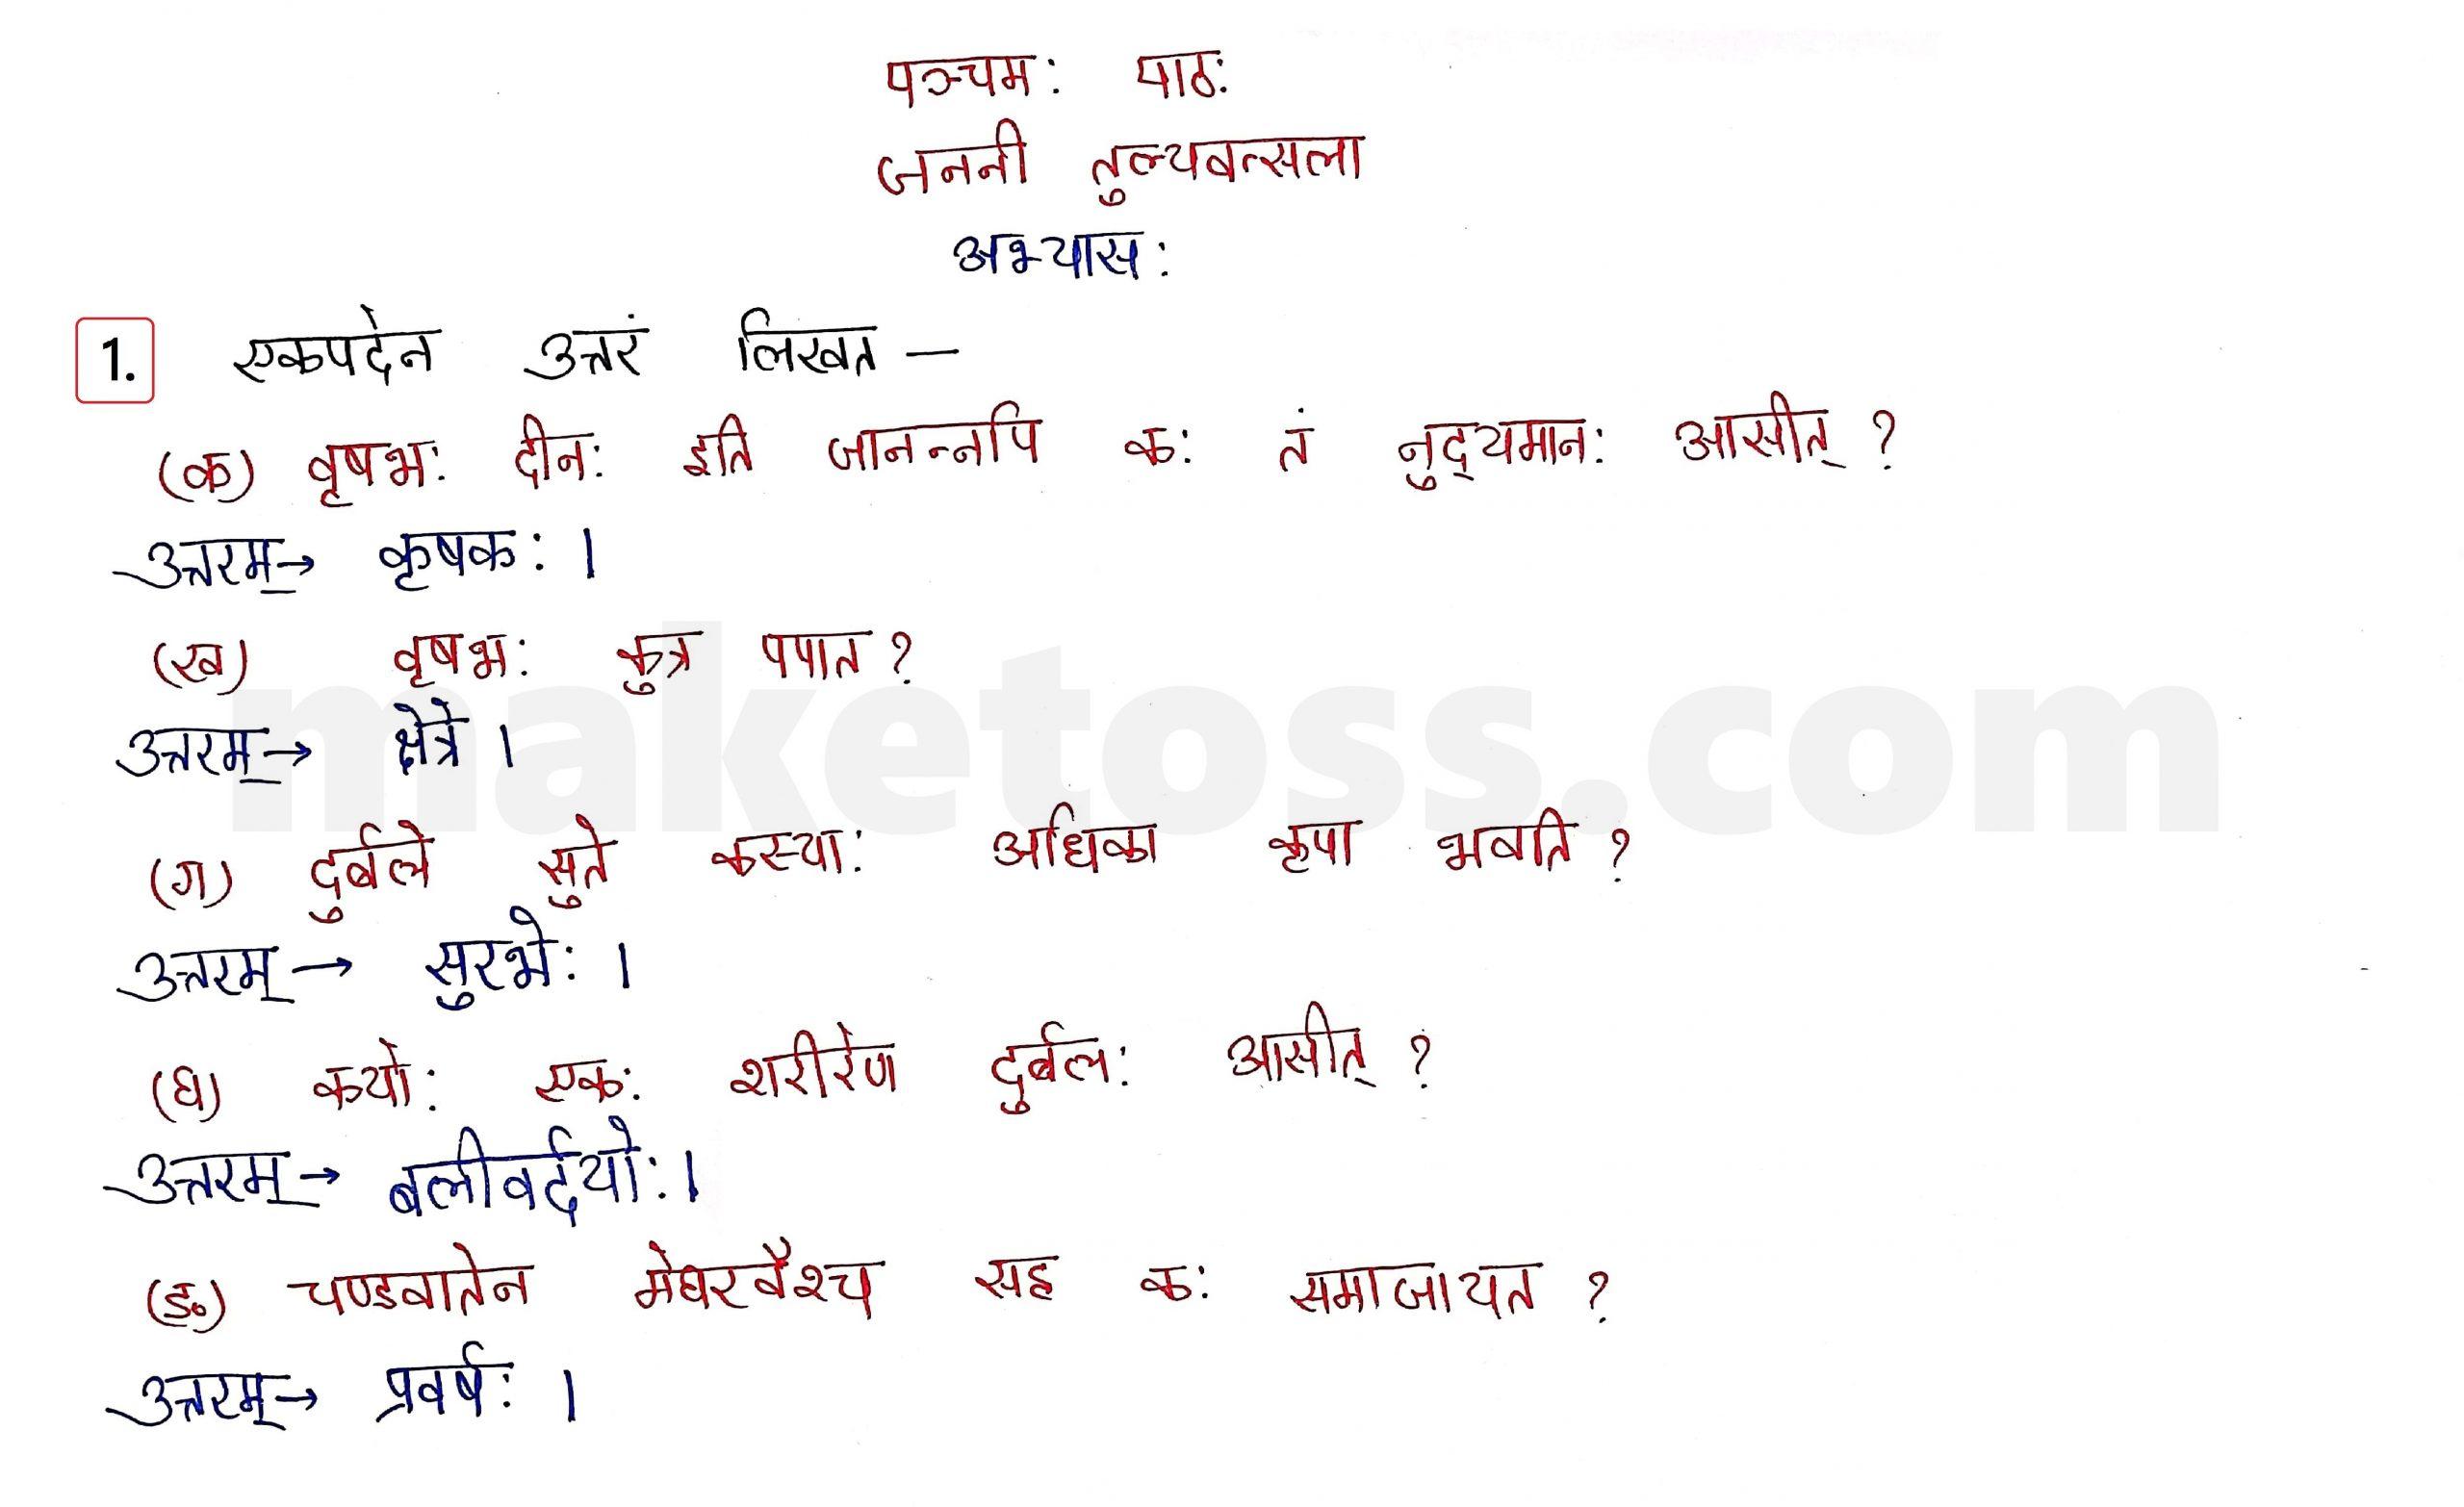 Sanskrit Class 10 - Chapter 5 - जननी तुल्यवत्सला  - Question 1 with Answer